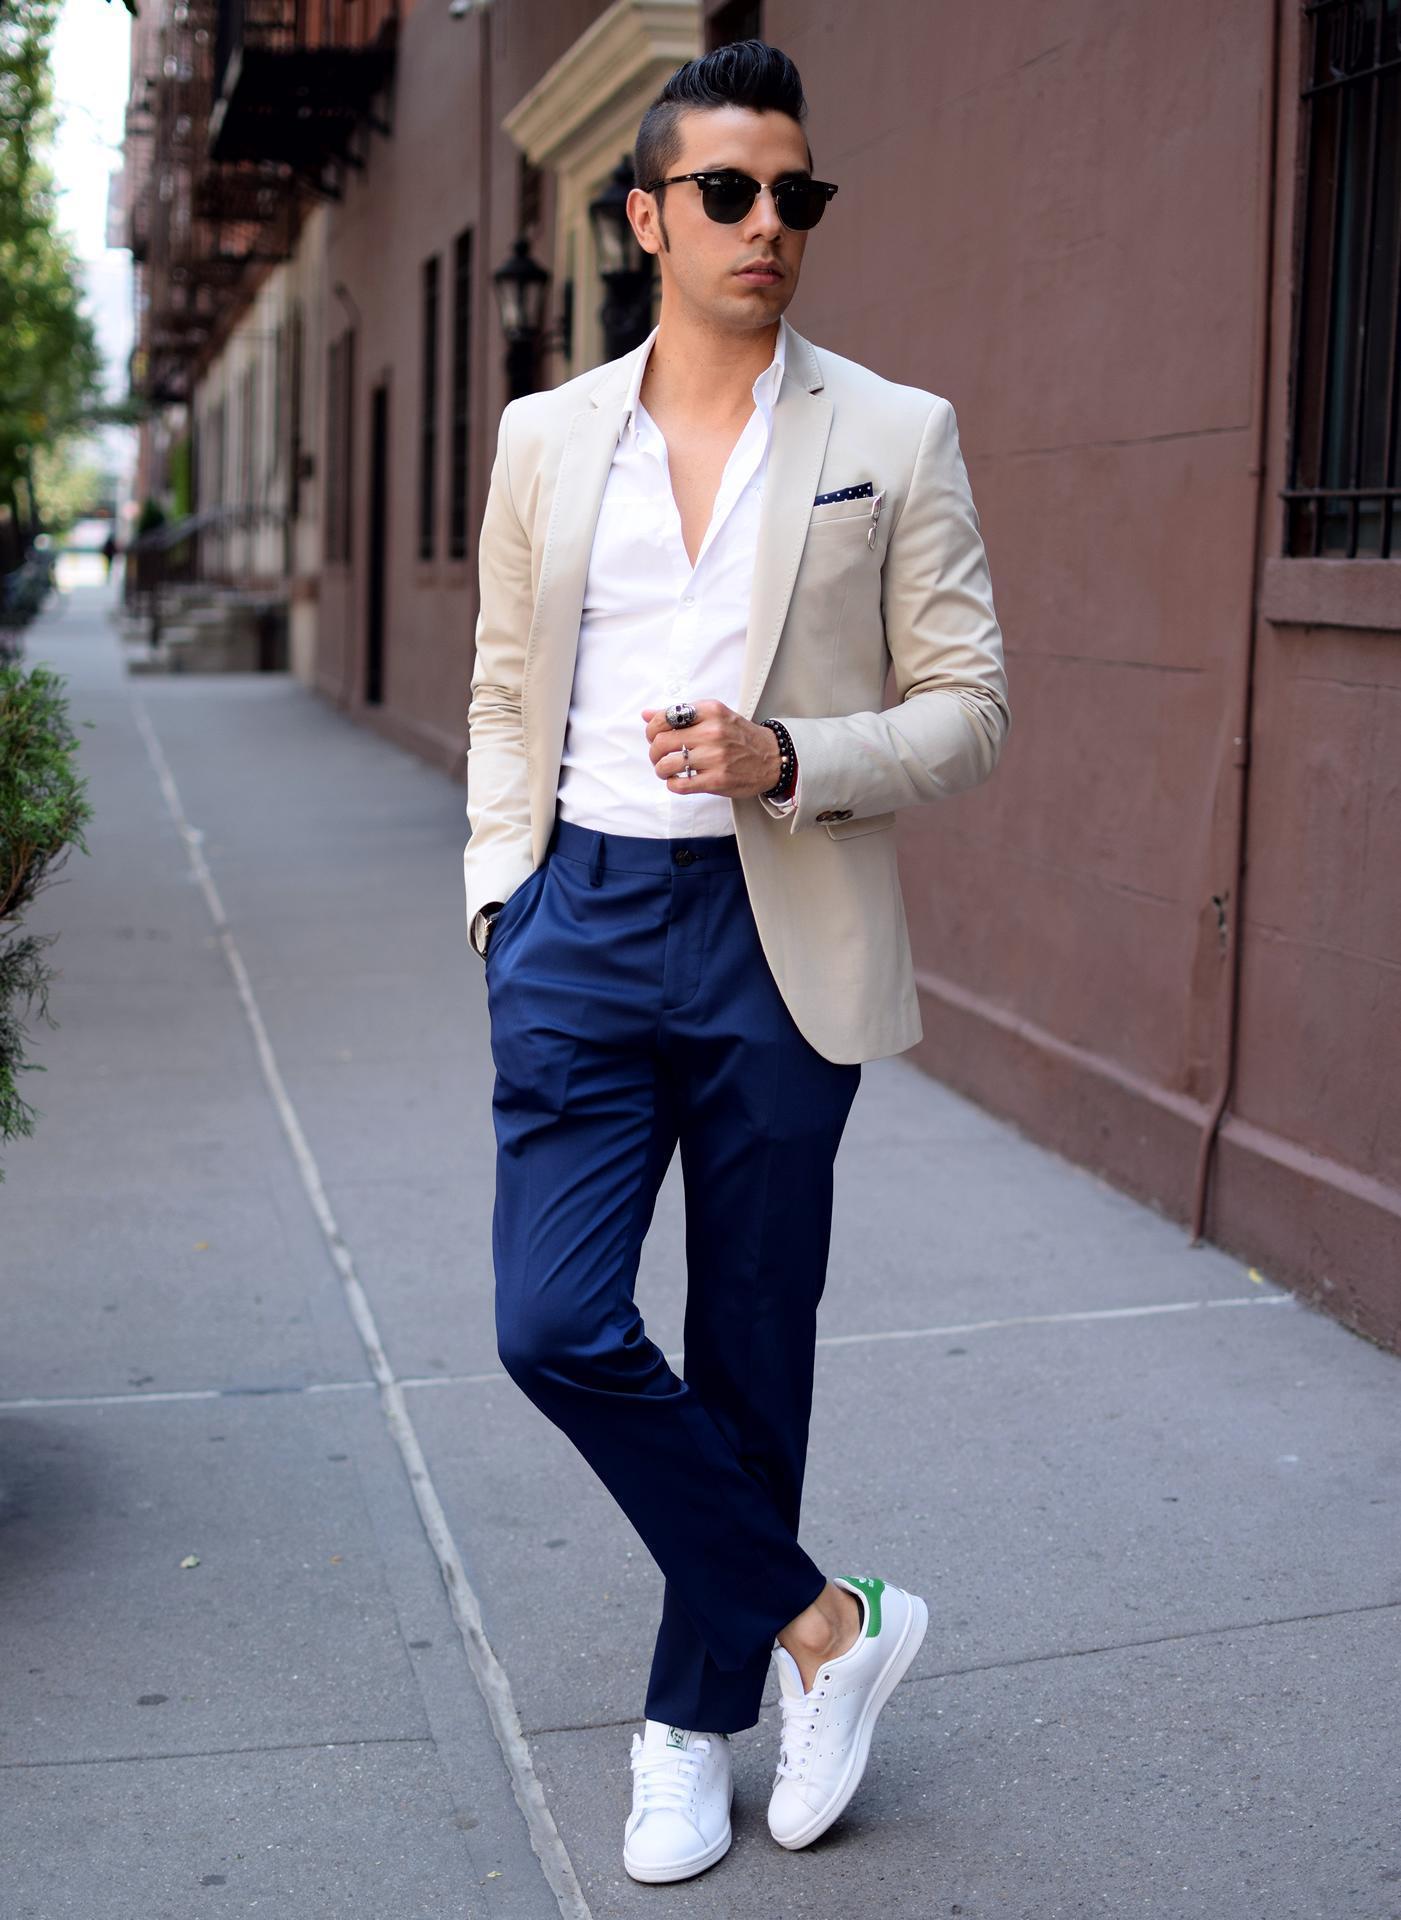 pantalon azul marino y camisa blanca hombre. Black Bedroom Furniture Sets. Home Design Ideas